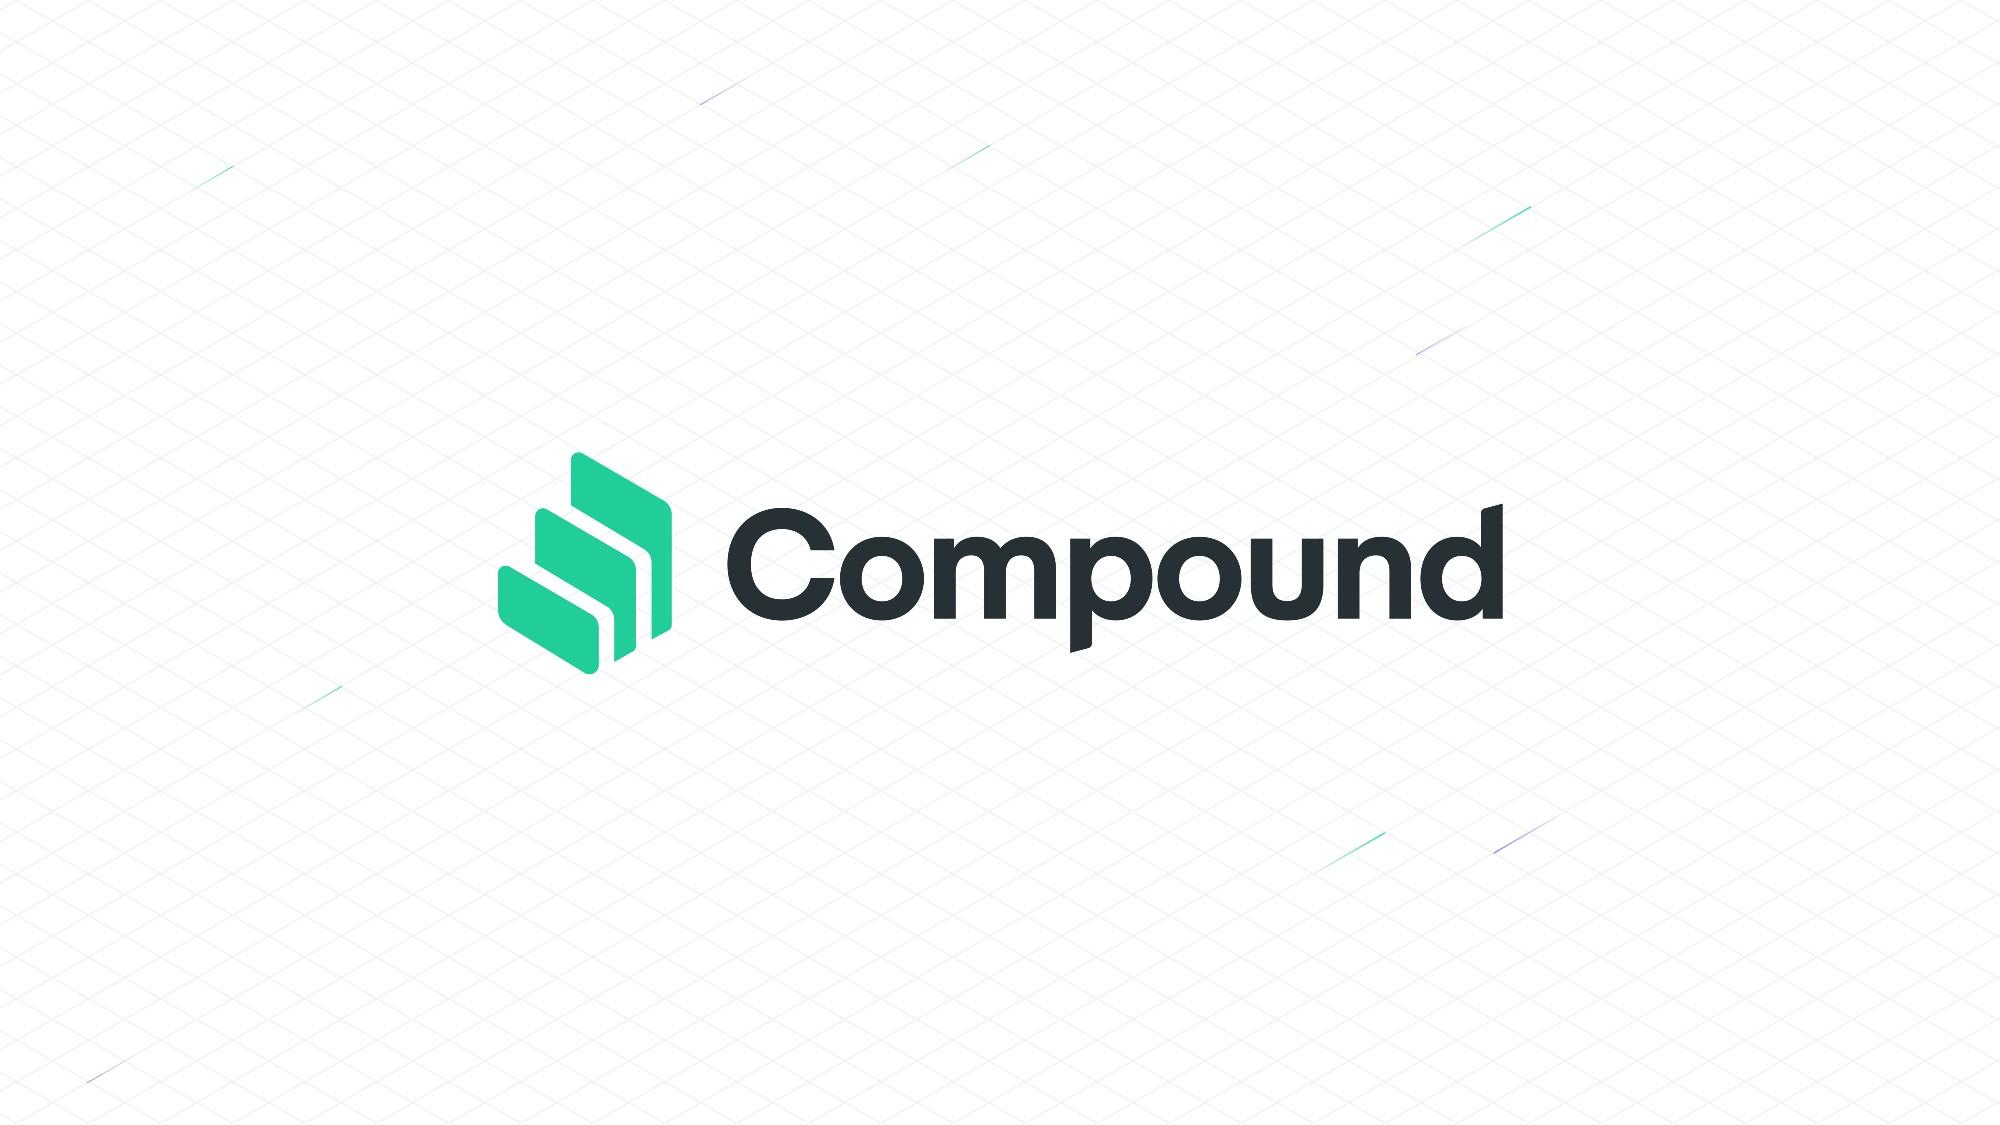 【DeFi技术解析】去中心化算法银行Compound技术解析之利率模型篇